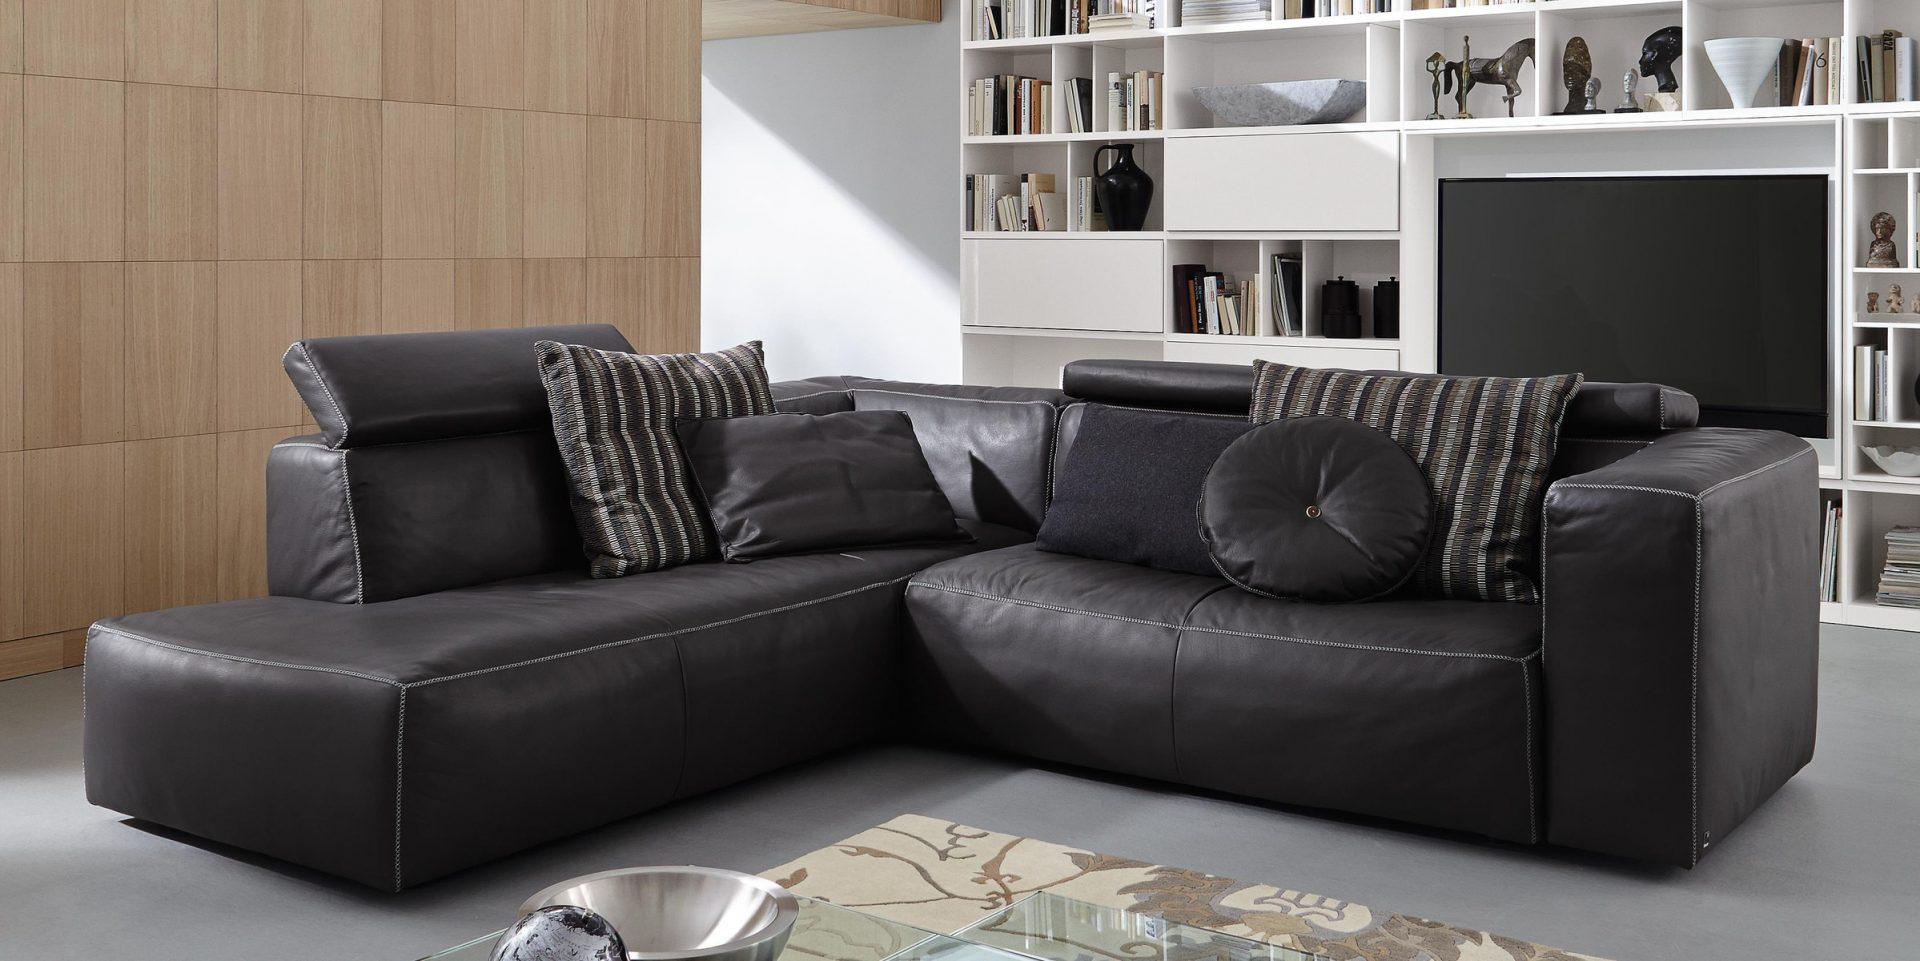 lizenz zum l mmeln wk 571 event. Black Bedroom Furniture Sets. Home Design Ideas